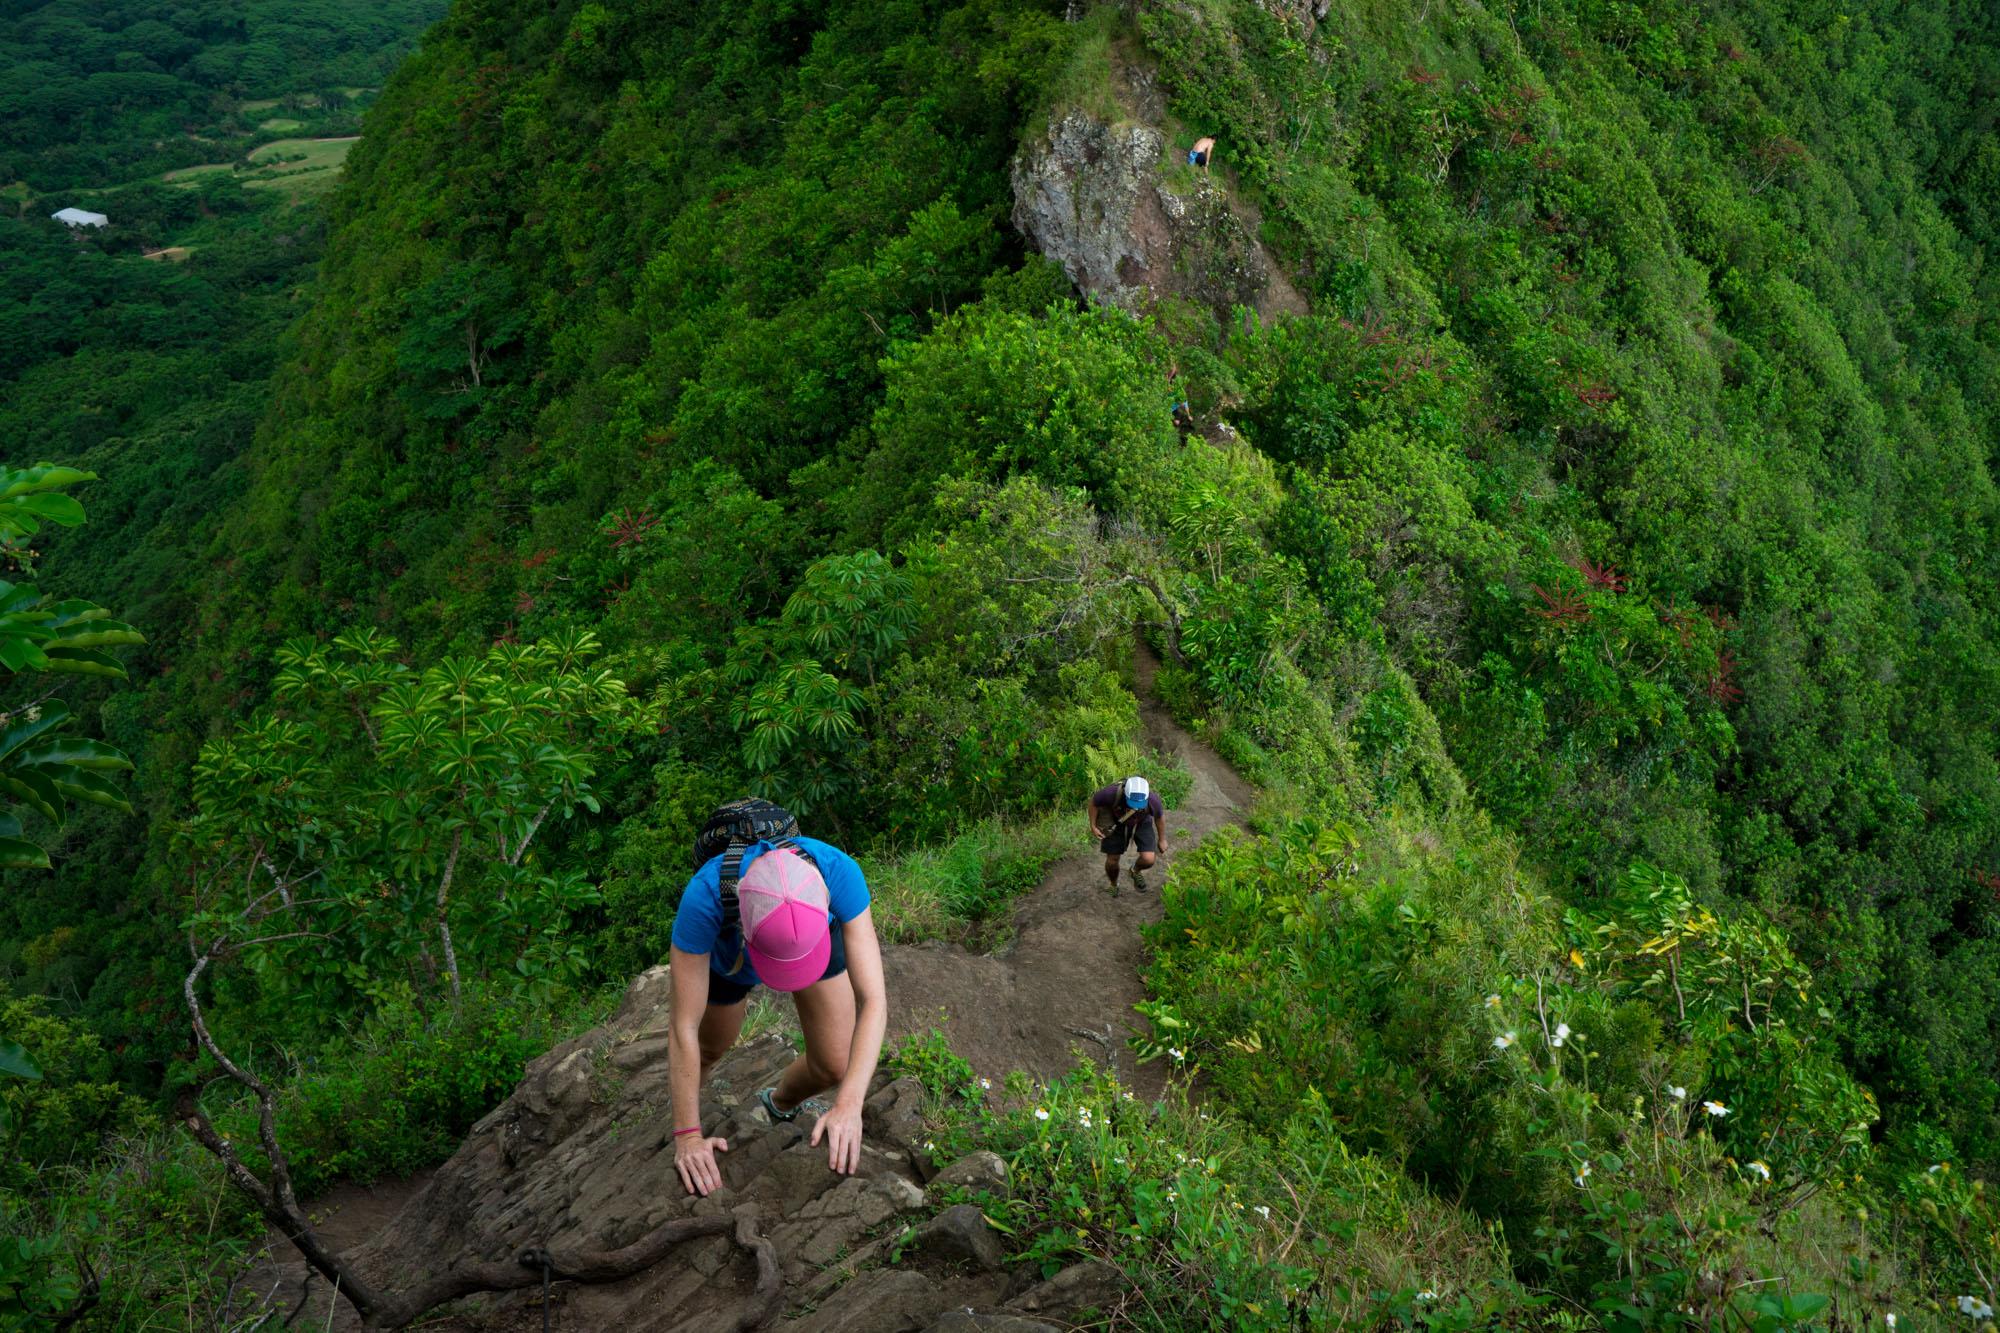 Laine & Owen climbing/hiking